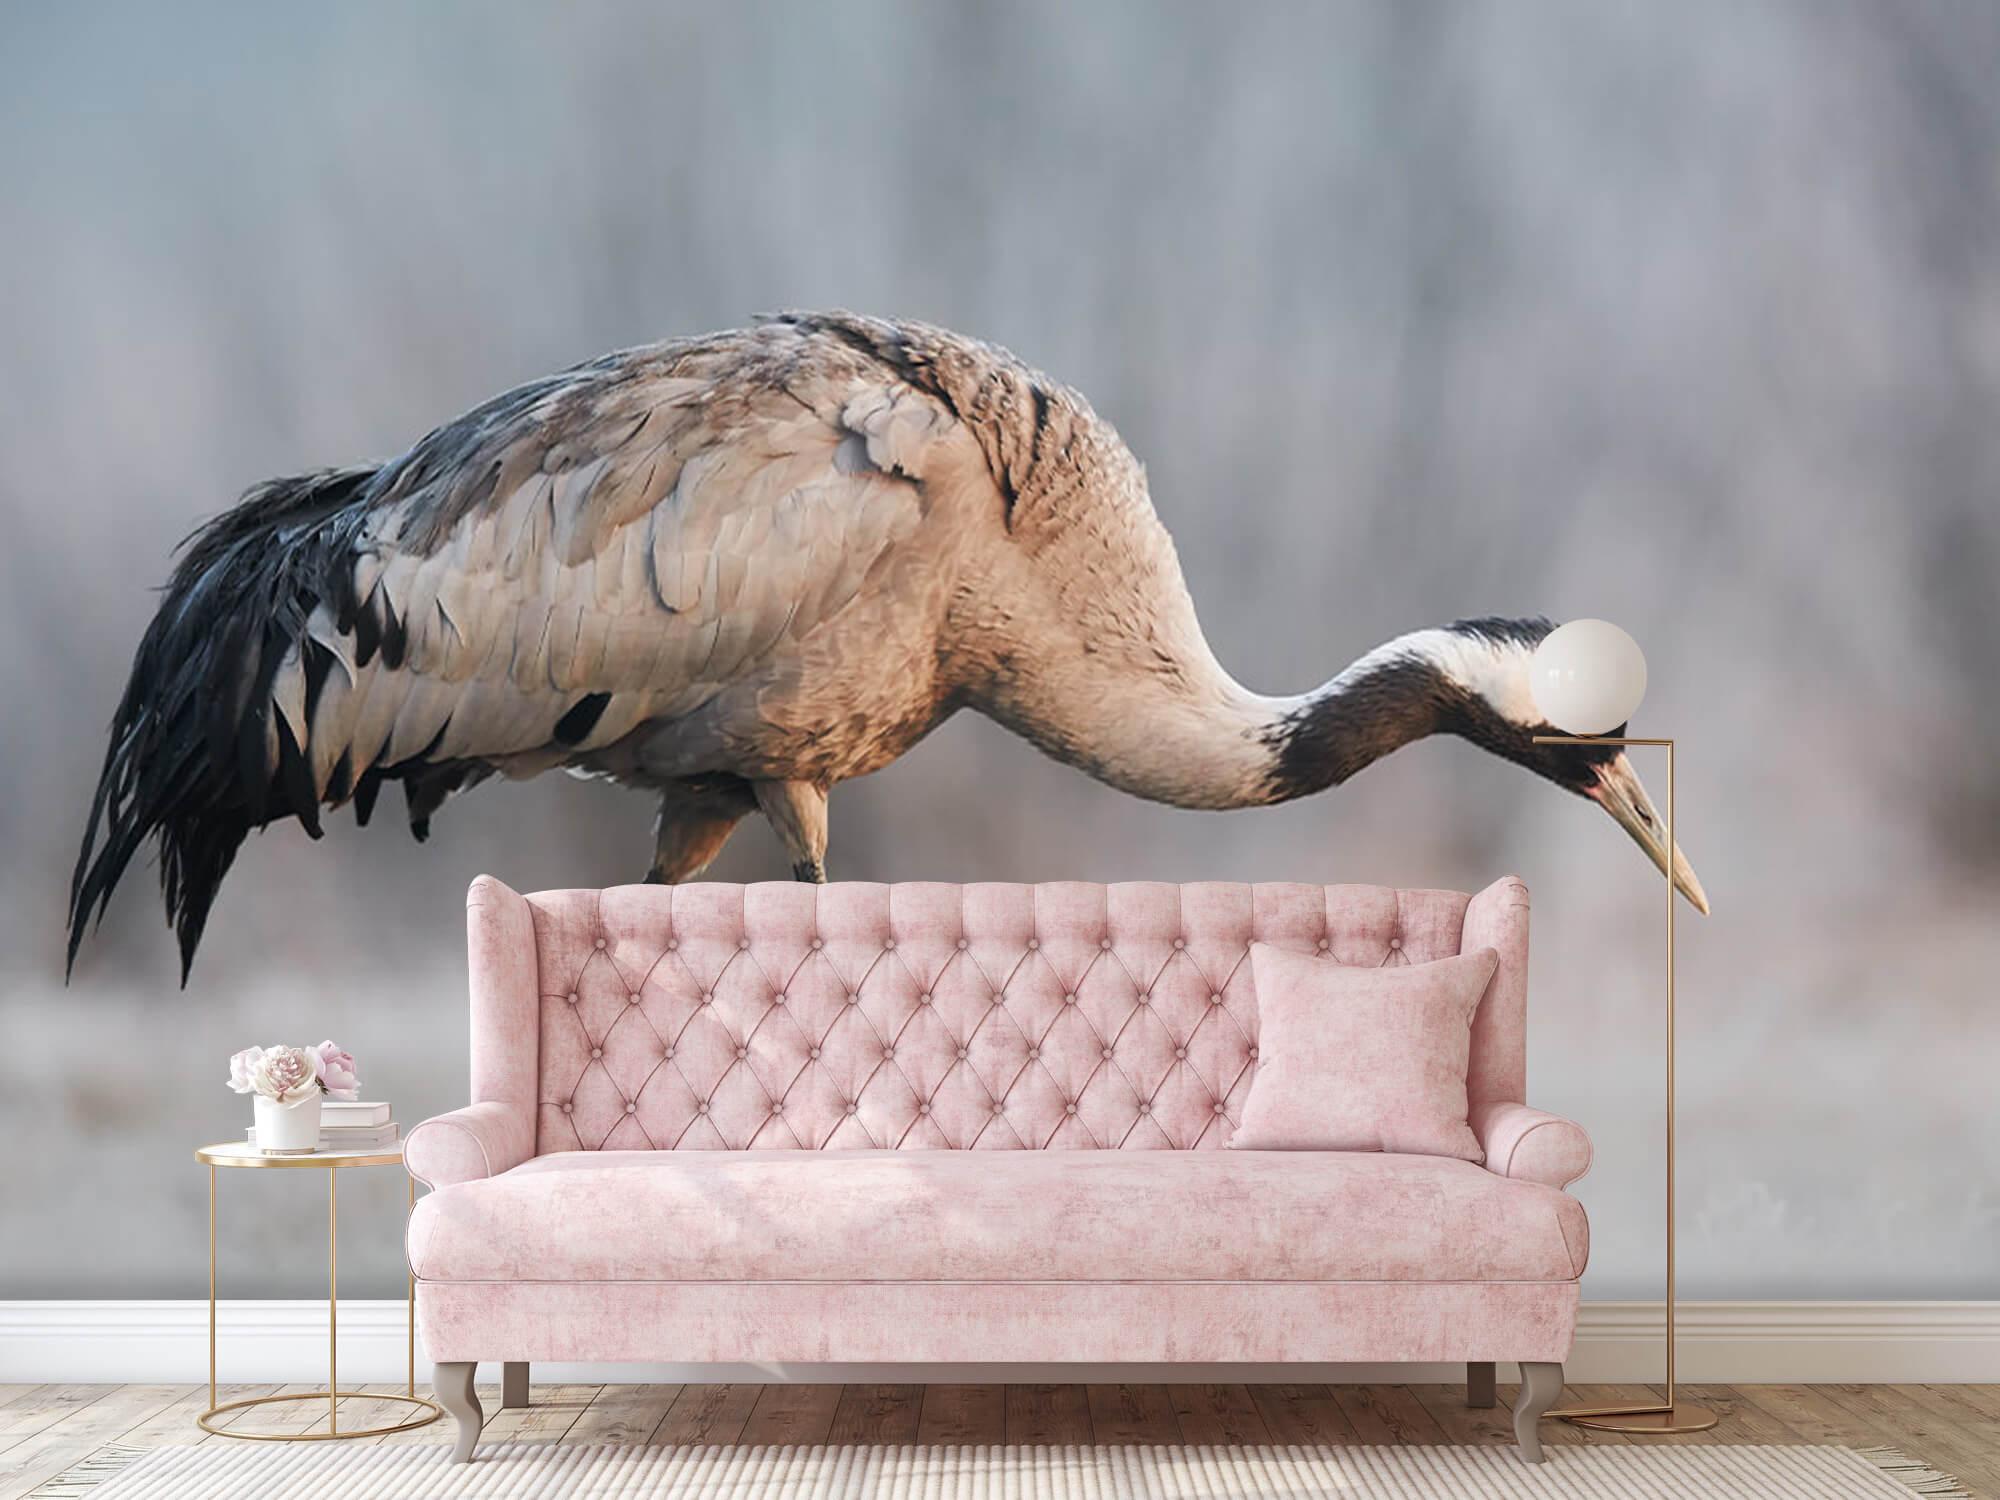 Kraanvogel in de ochtend 4